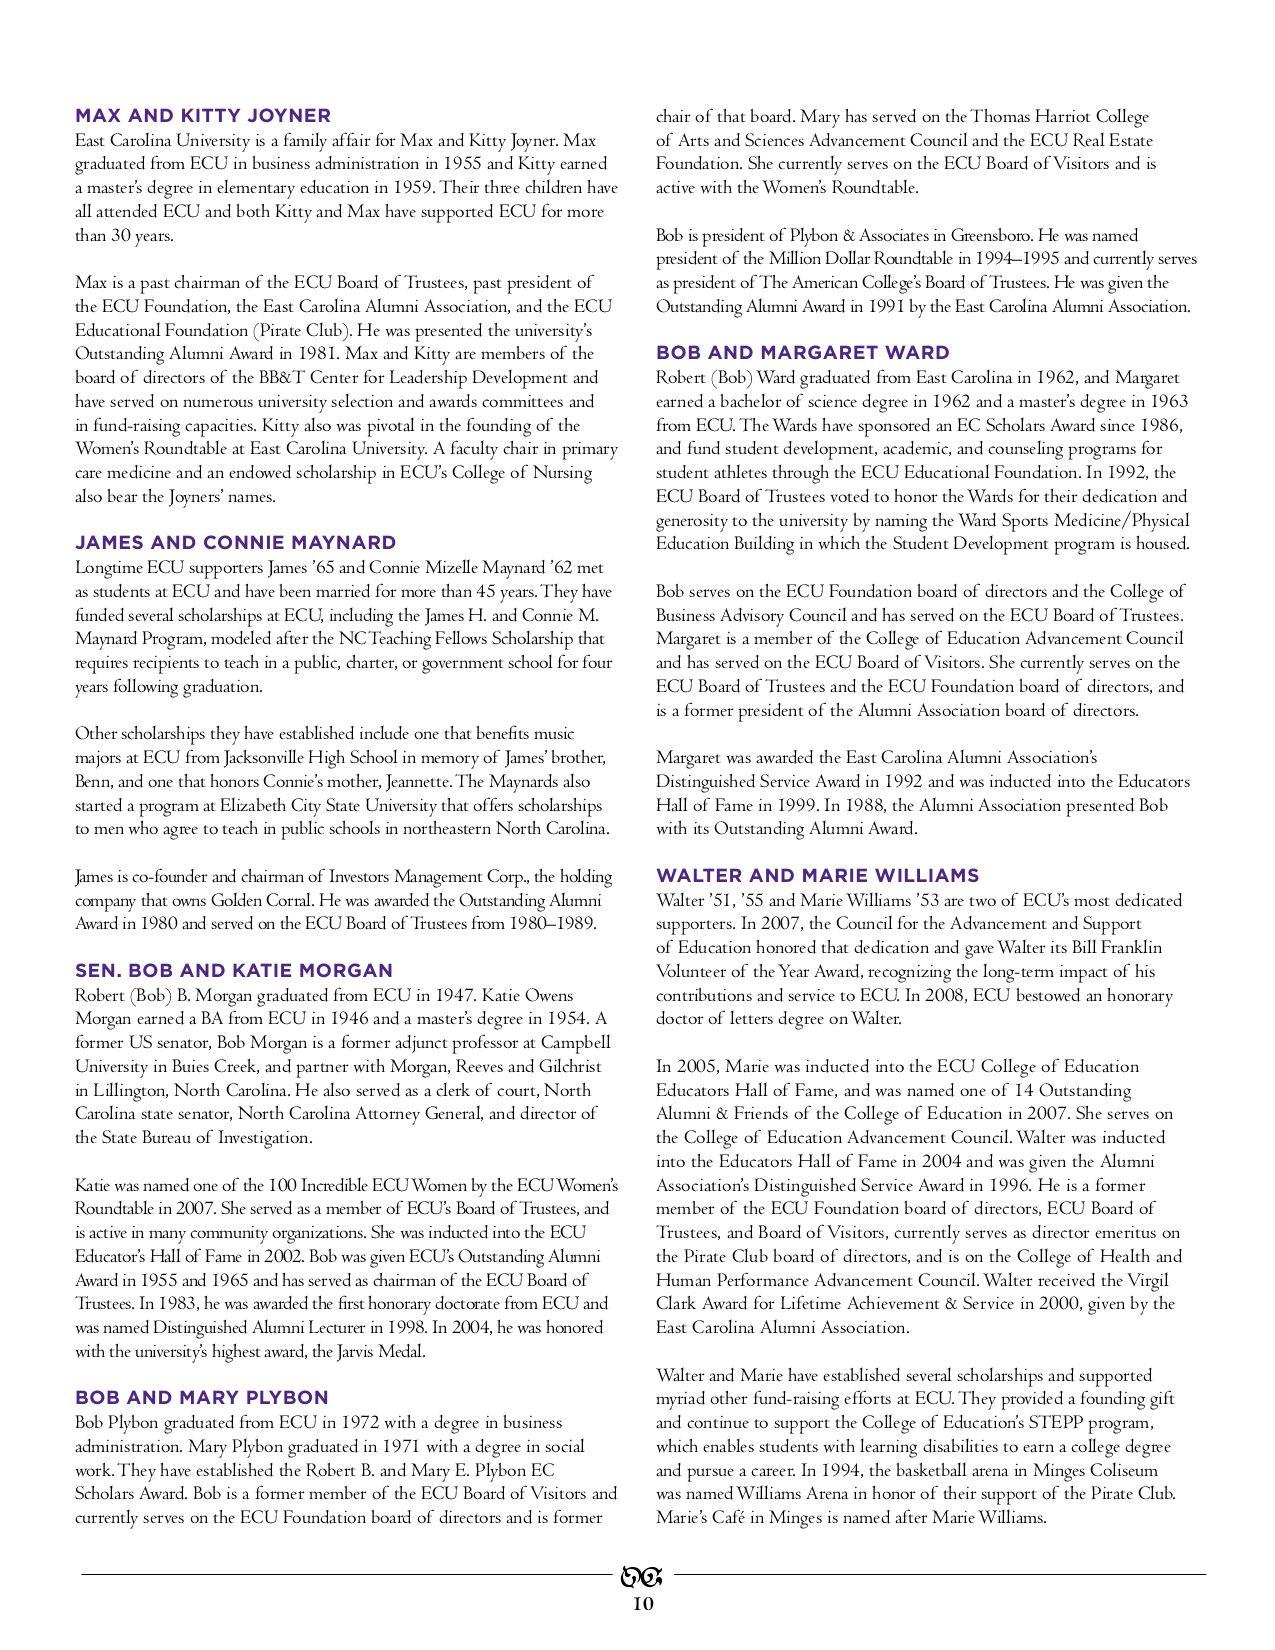 Ecu Foundations Annual Report 2007 2008 By East Carolina University